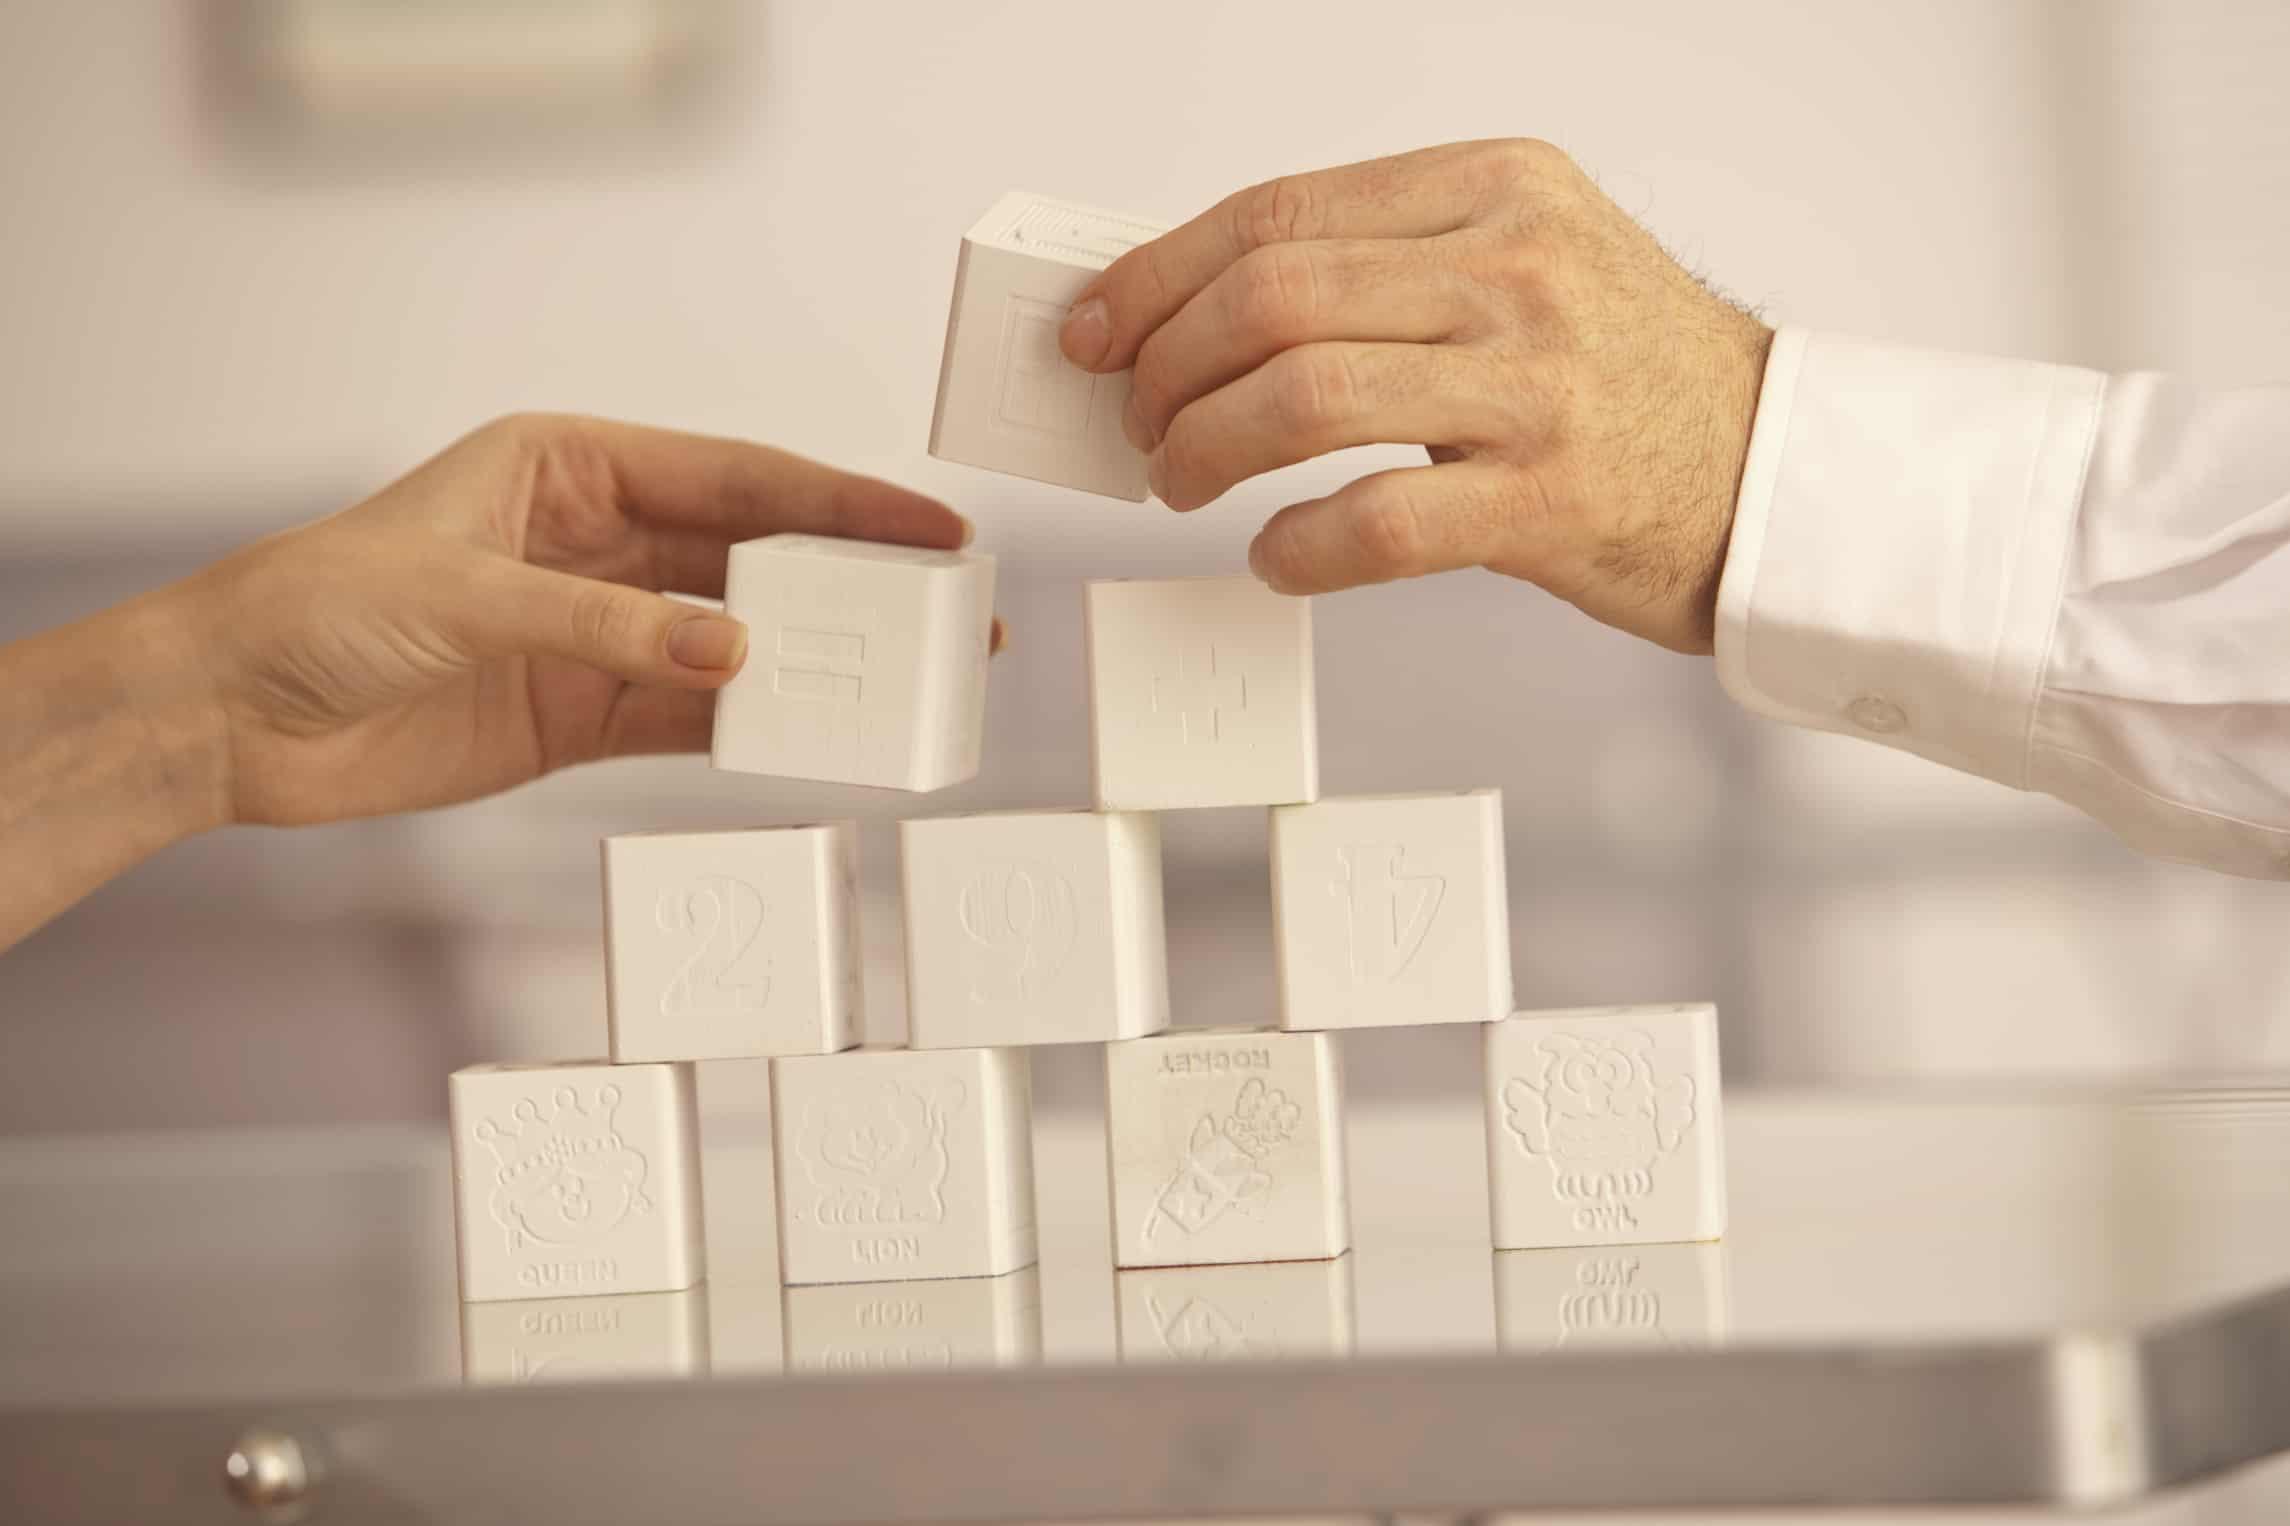 hands biulding blocks